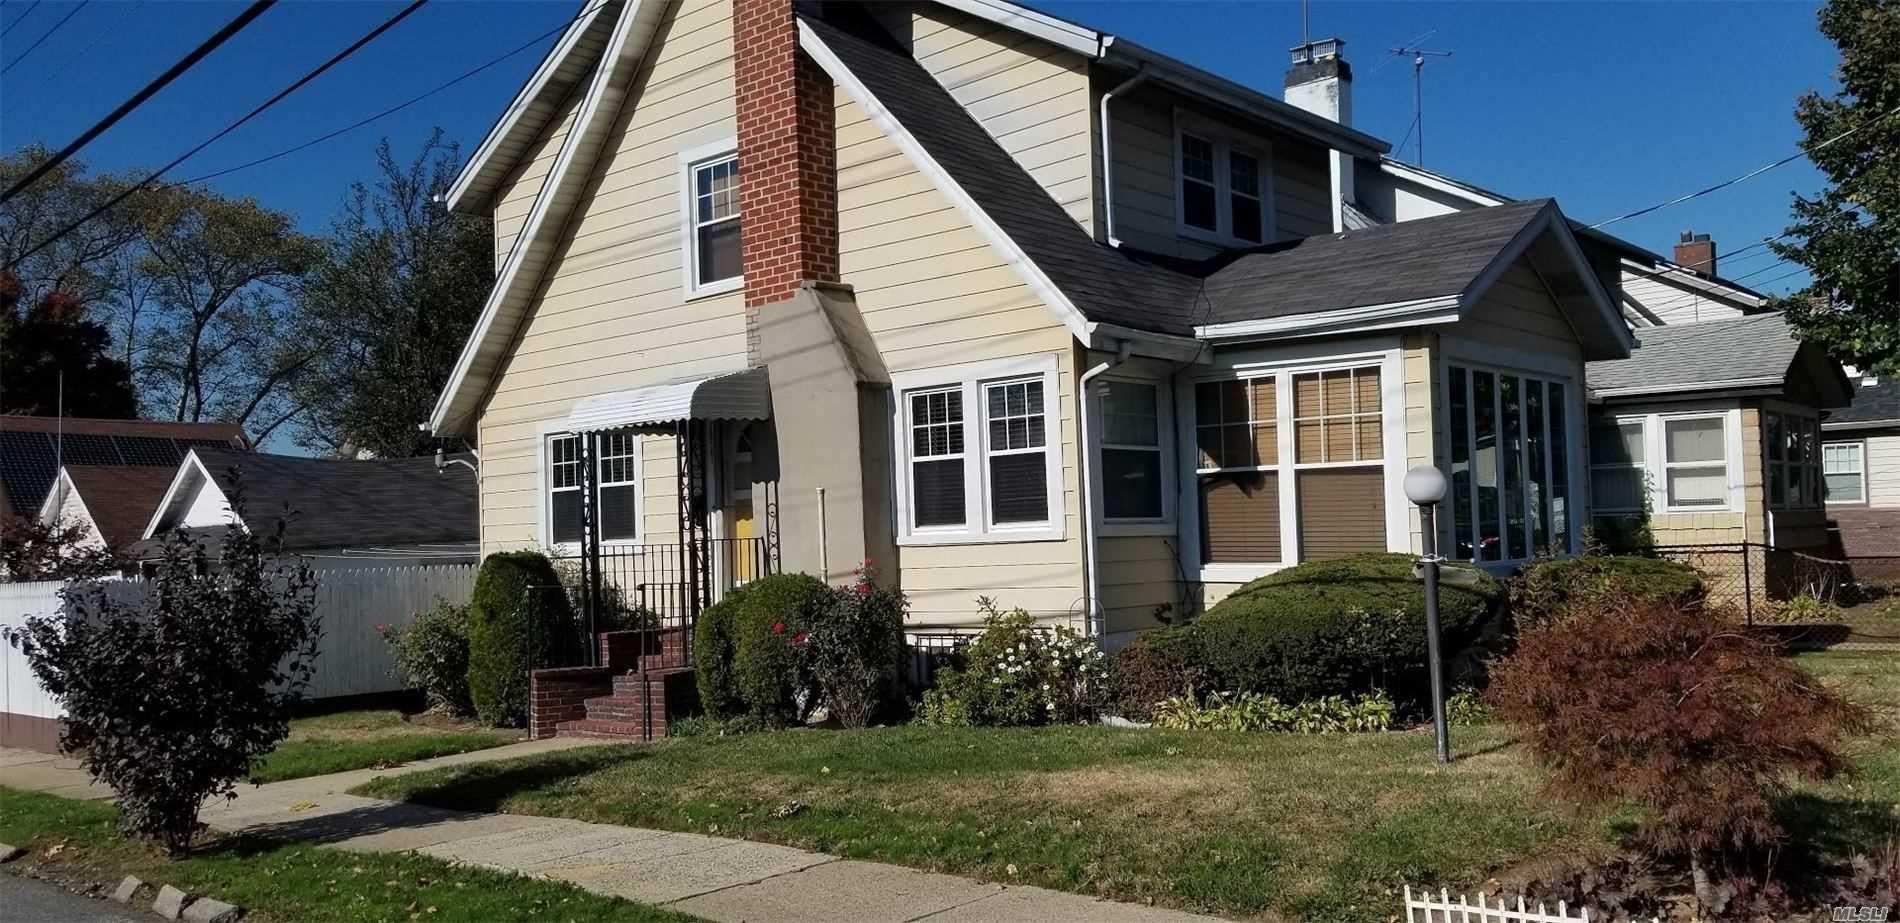 187-01 Jordan Avenue, St. Albans, NY 11412 - MLS#: 3215036